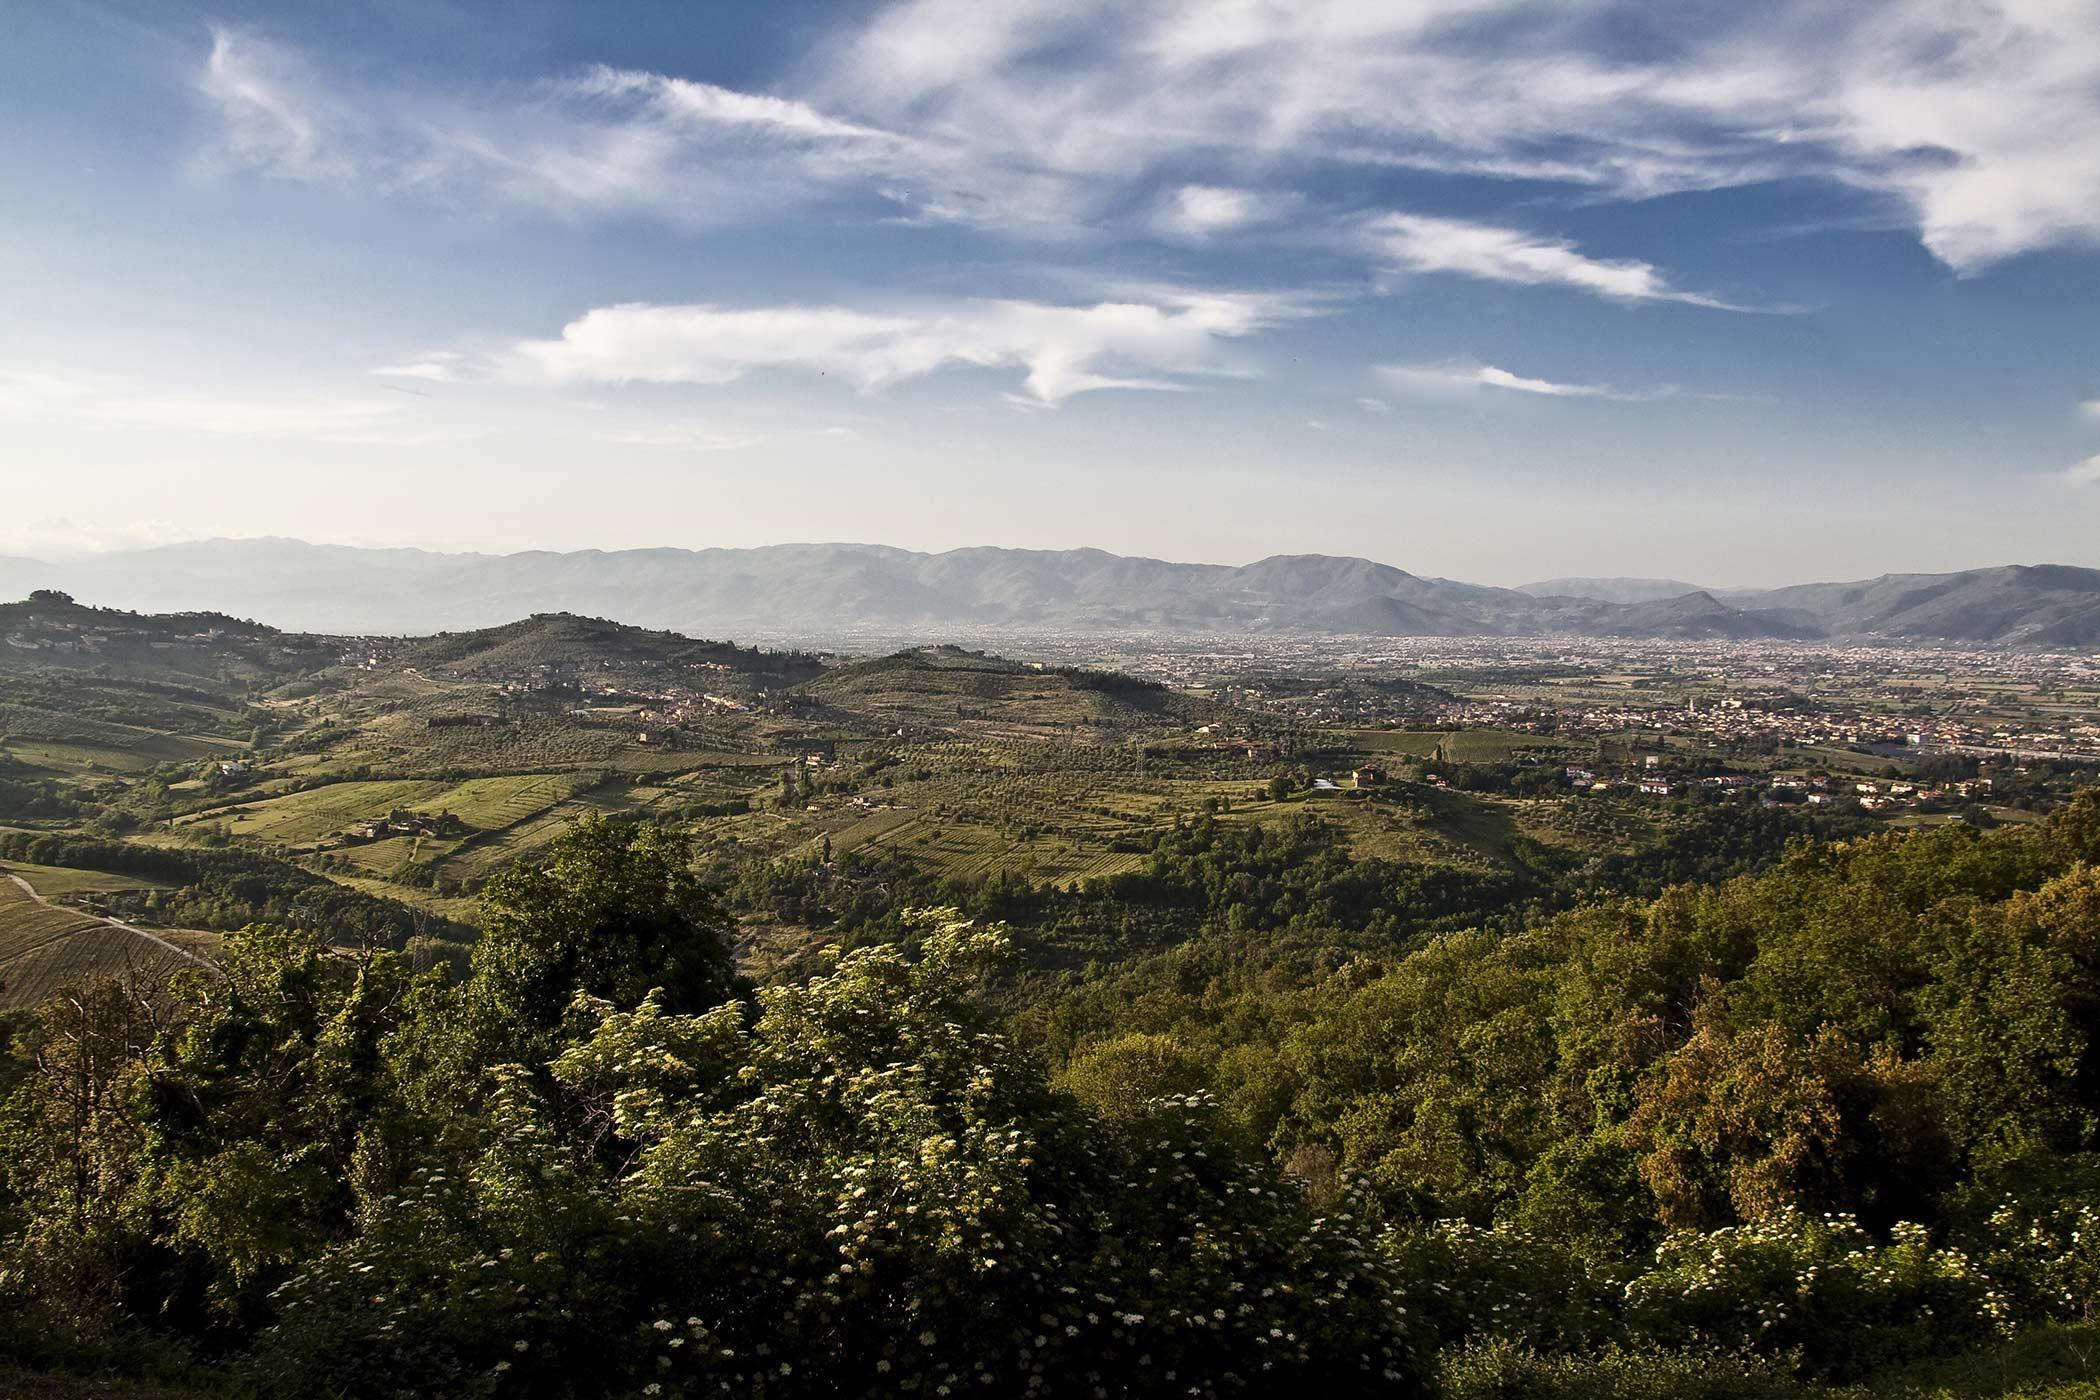 Villa Artimino / Claudia